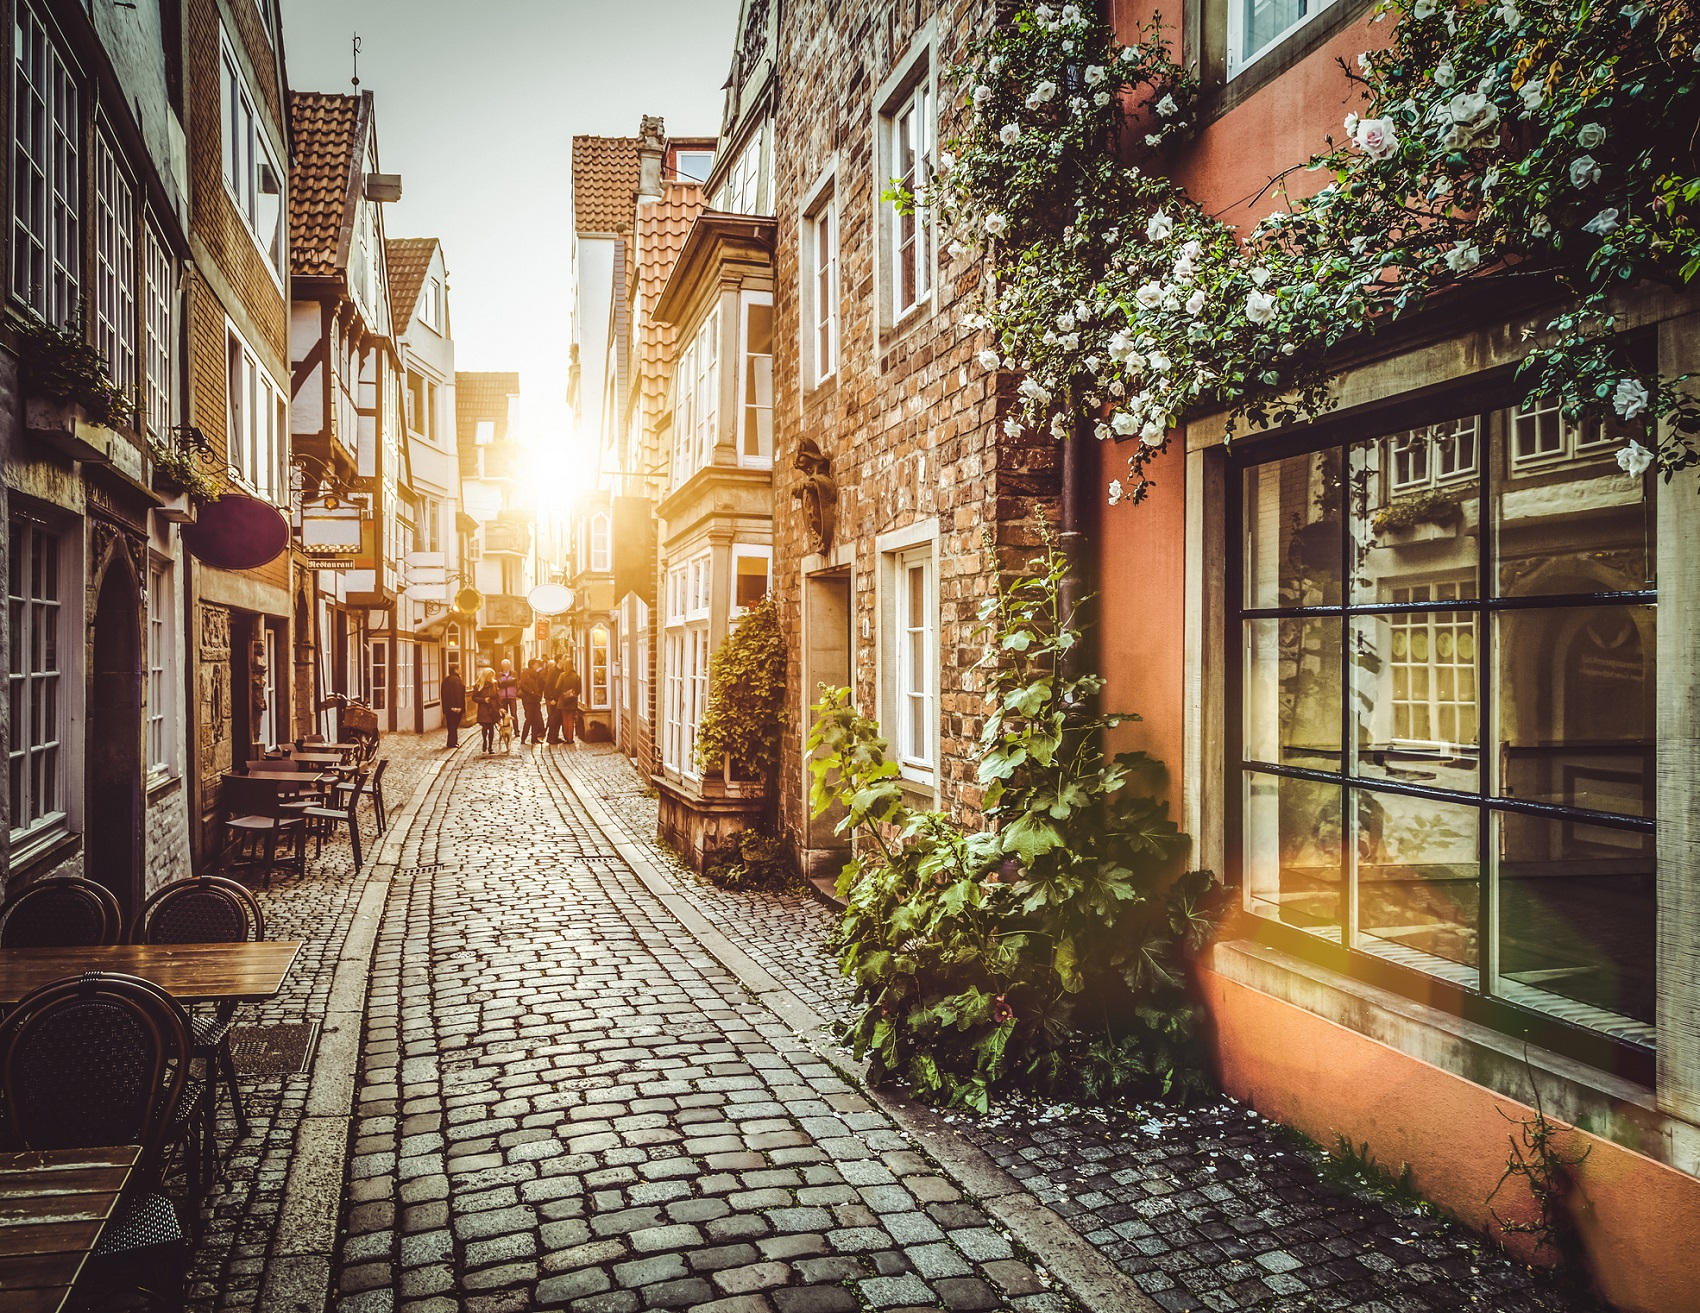 bremen-old-town